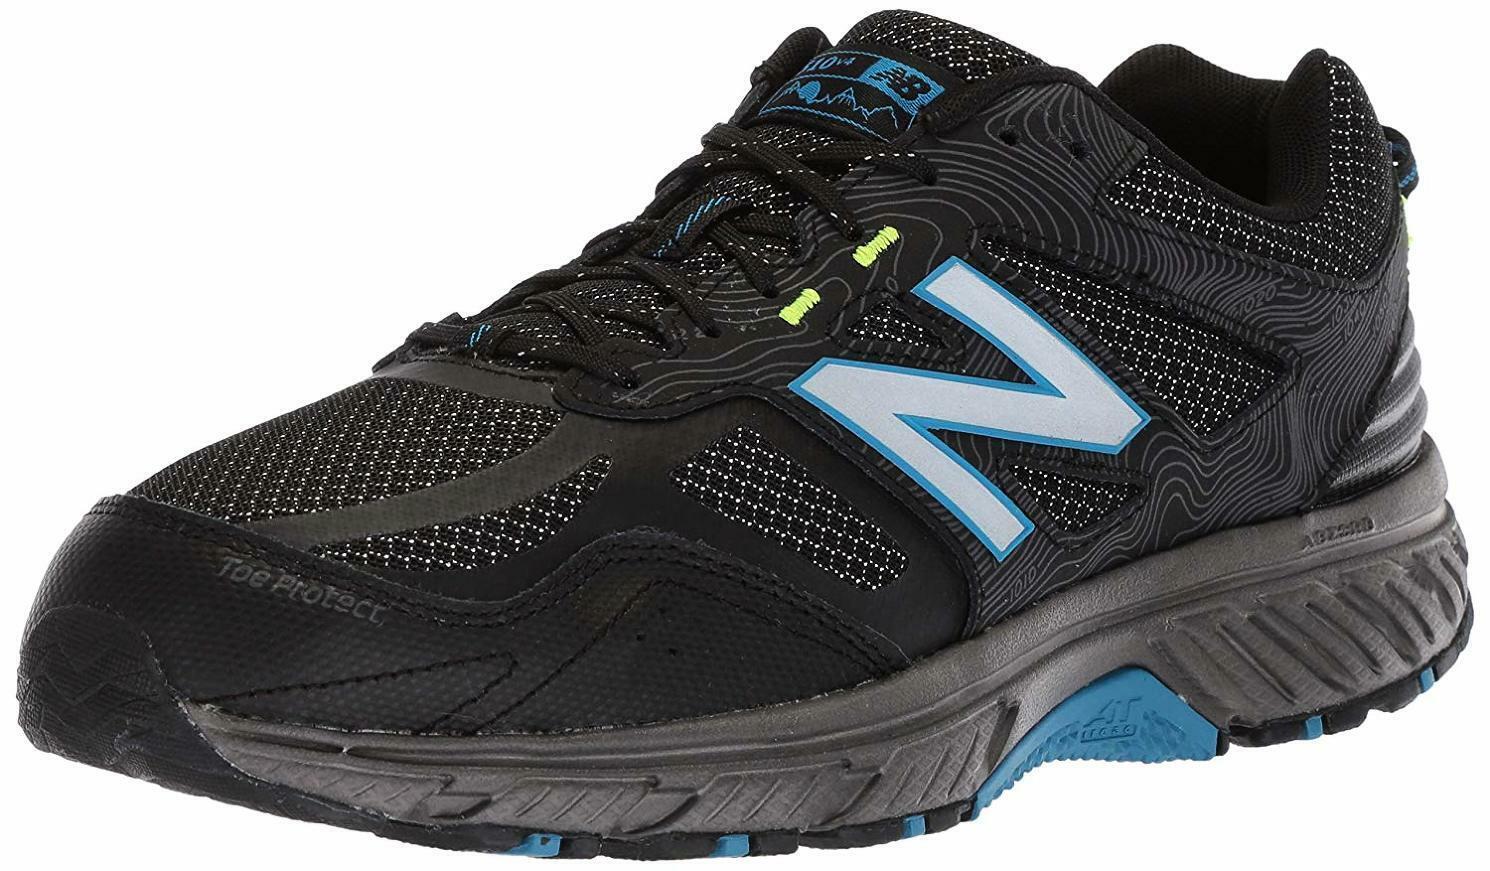 New Balance Men's 510v4 Trail Running shoes - Choose SZ color